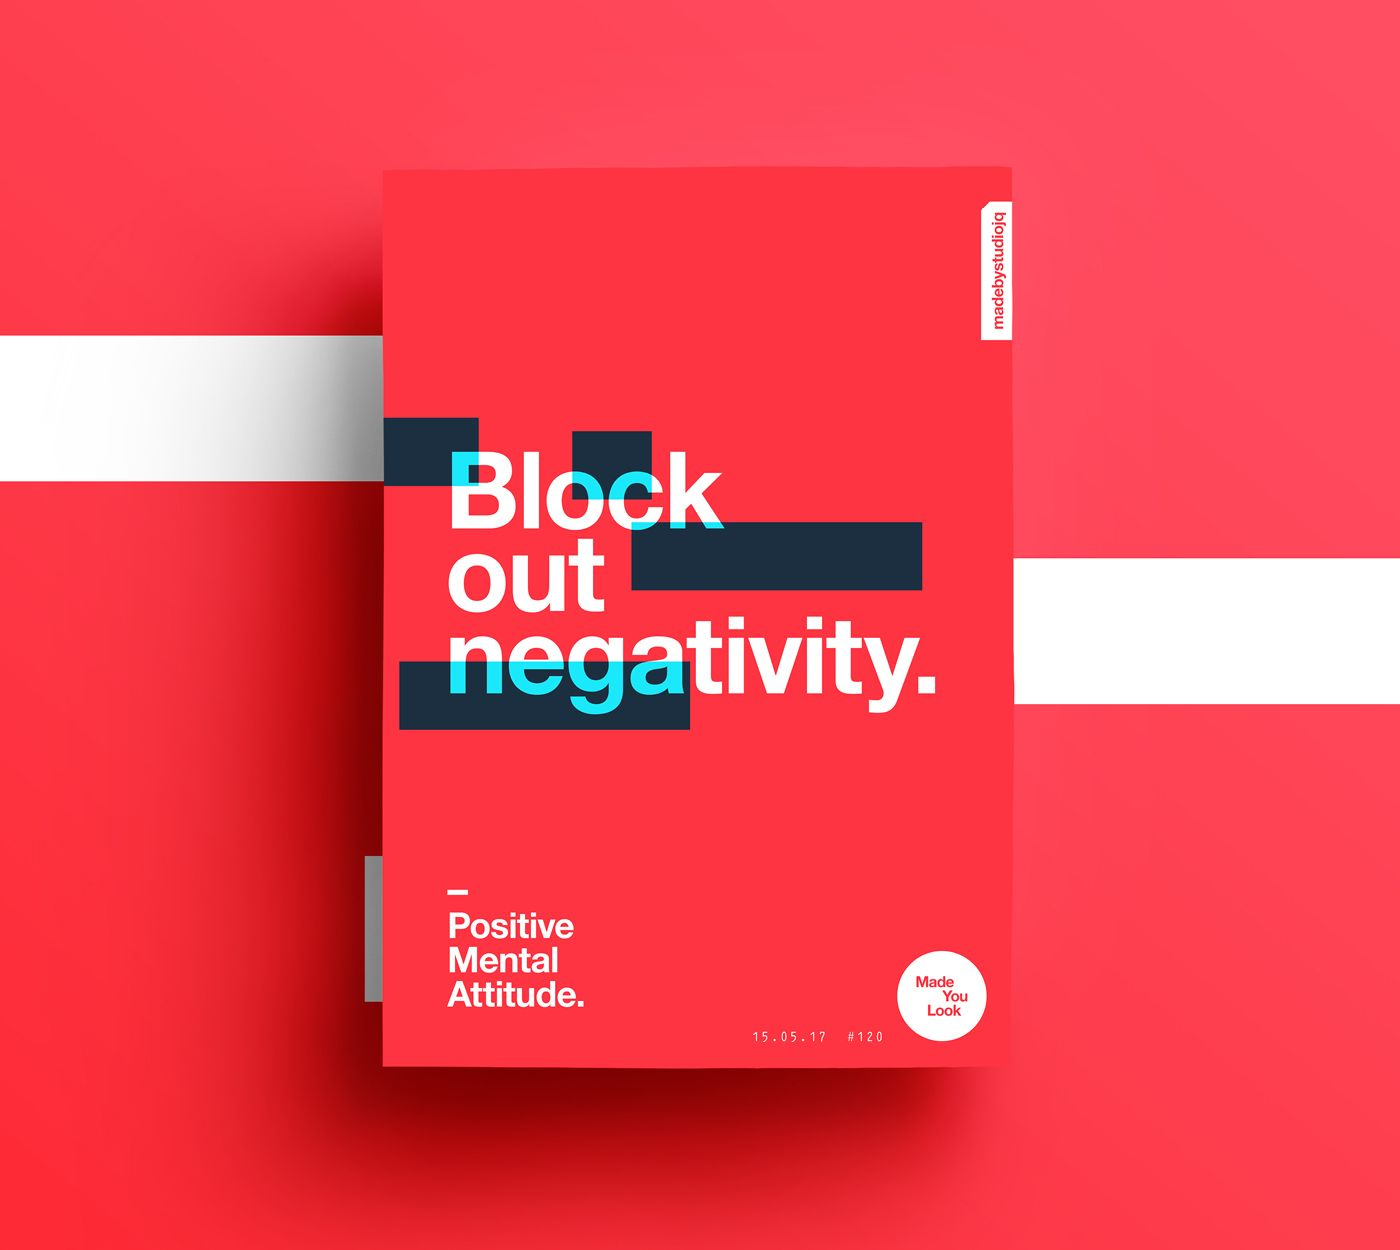 made you look poster creatividad